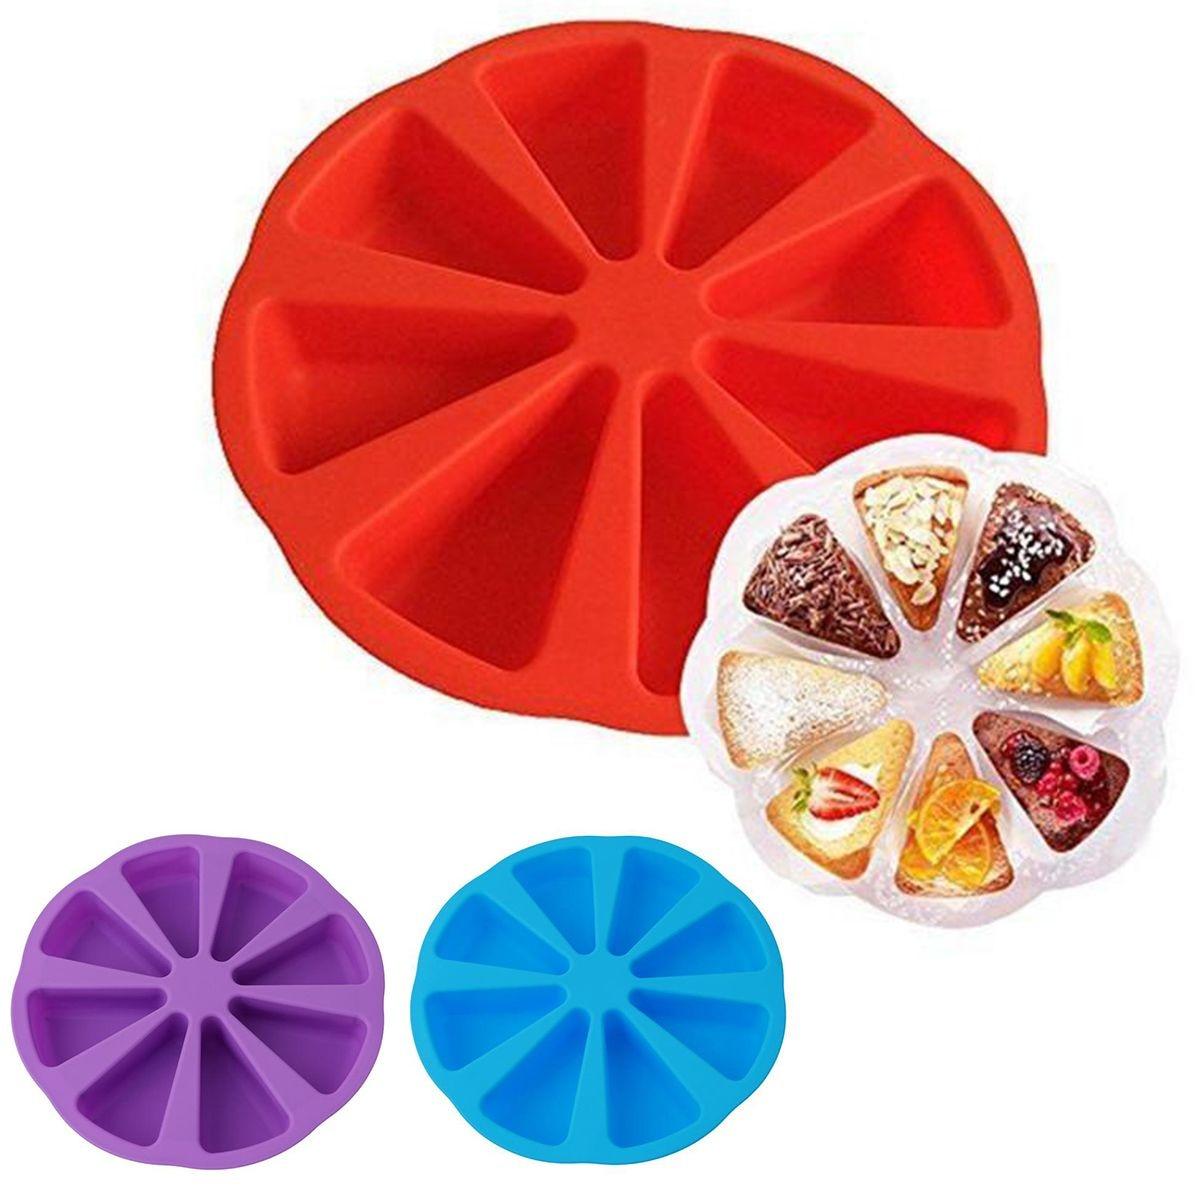 1 ud. Molde de silicona con 8 cavidades para tartas